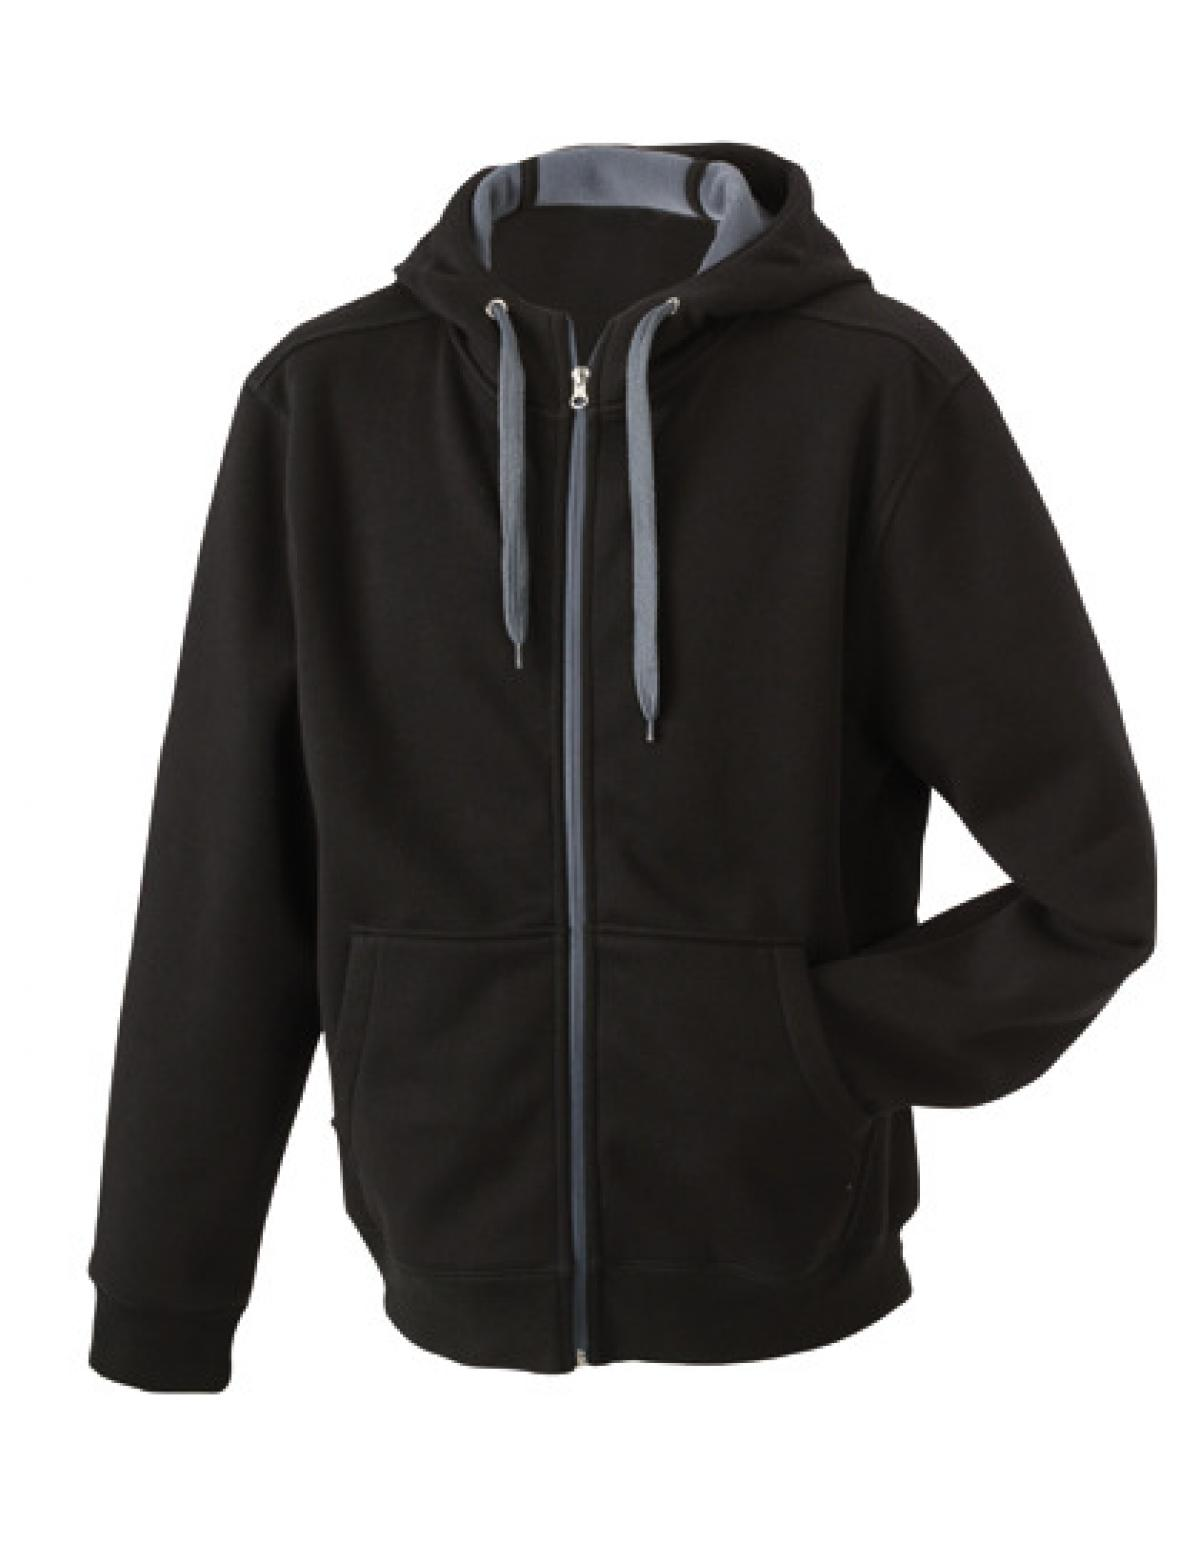 damen doubleface jacket hoodie mit kaputze james nicholson ebay. Black Bedroom Furniture Sets. Home Design Ideas